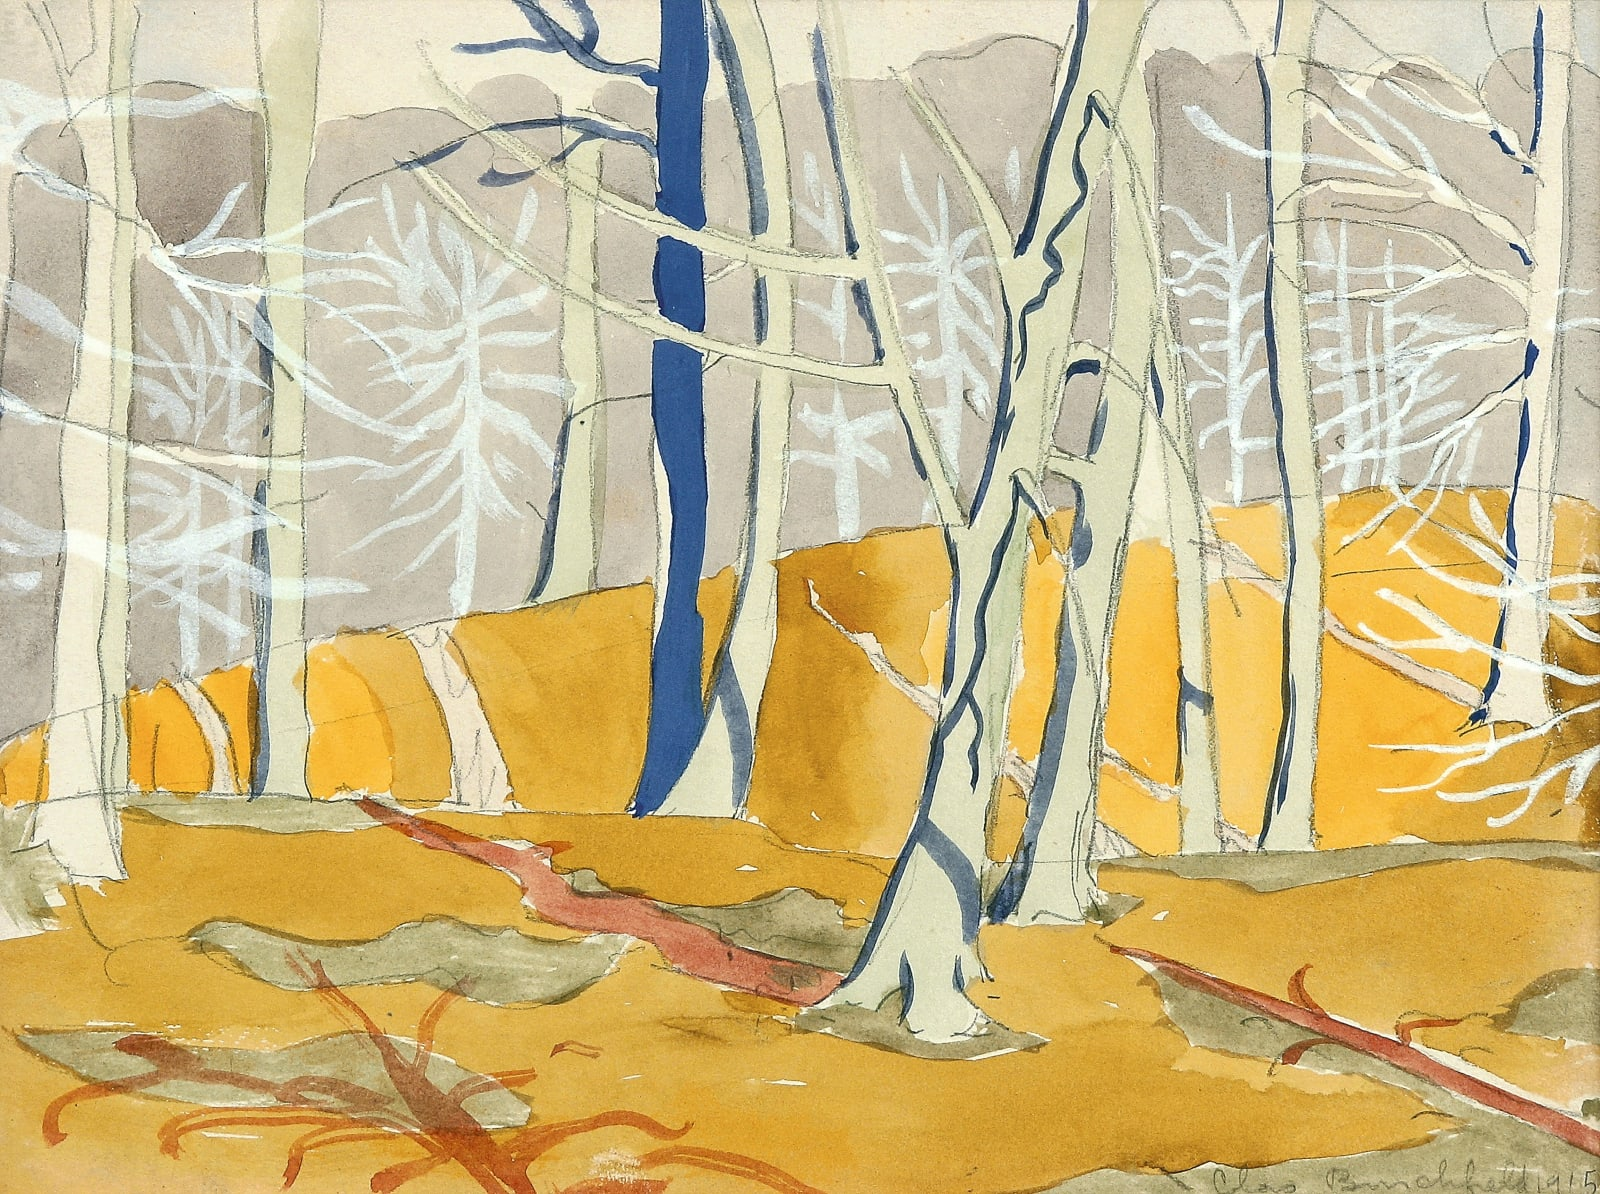 Charles Ephraim Burchfield, Winter Sun, 1915